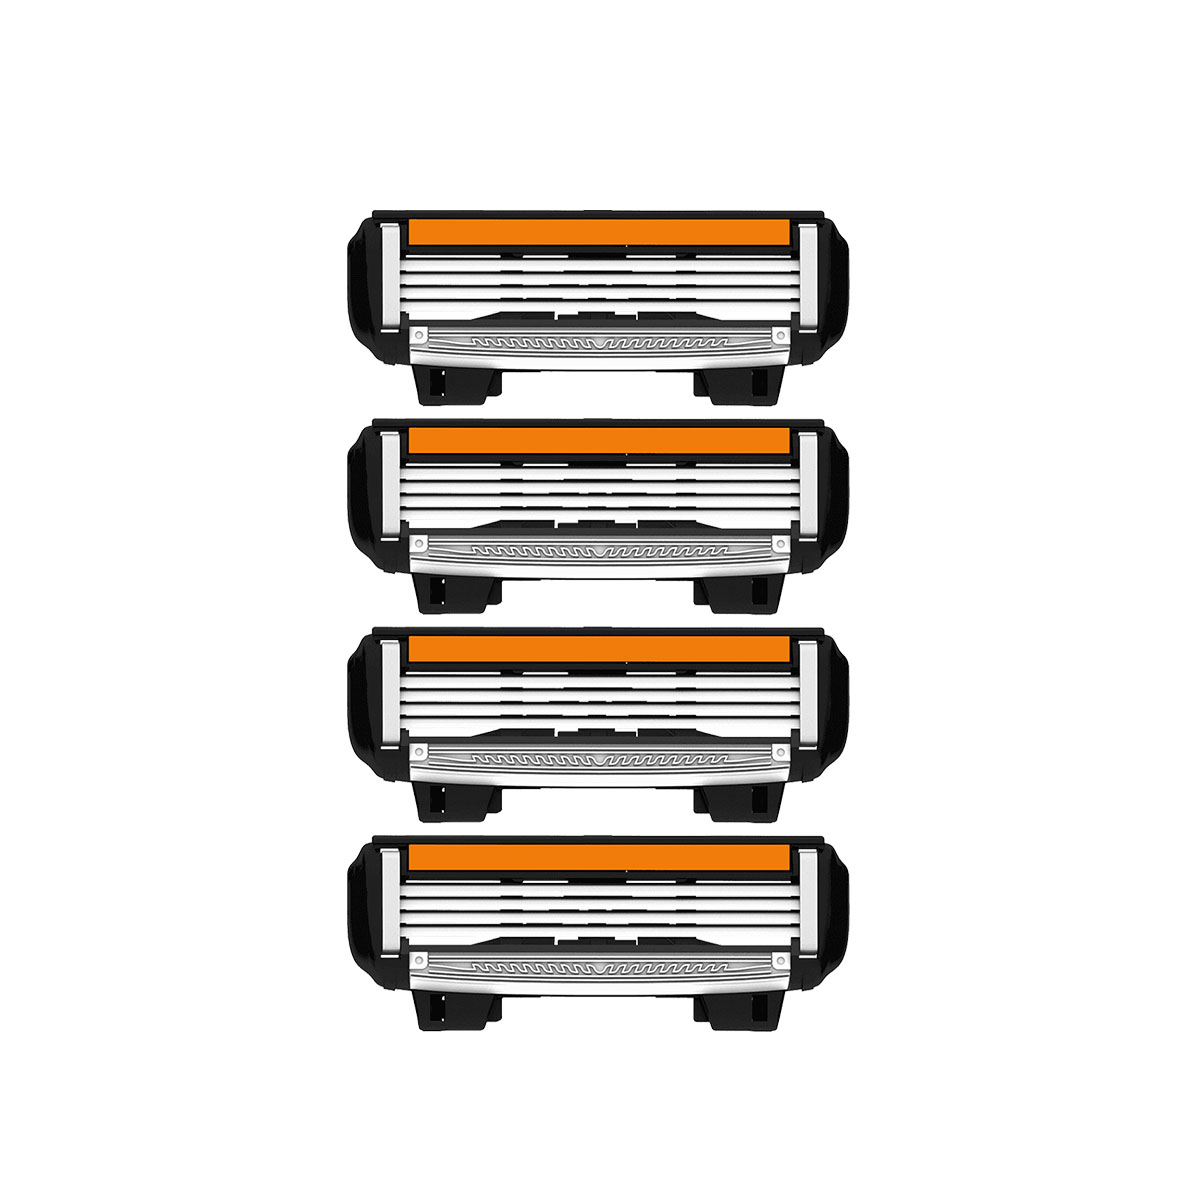 LetsShave | LetsShave Pro 4 Shaving Blades - Pack of 4 Razor Blades